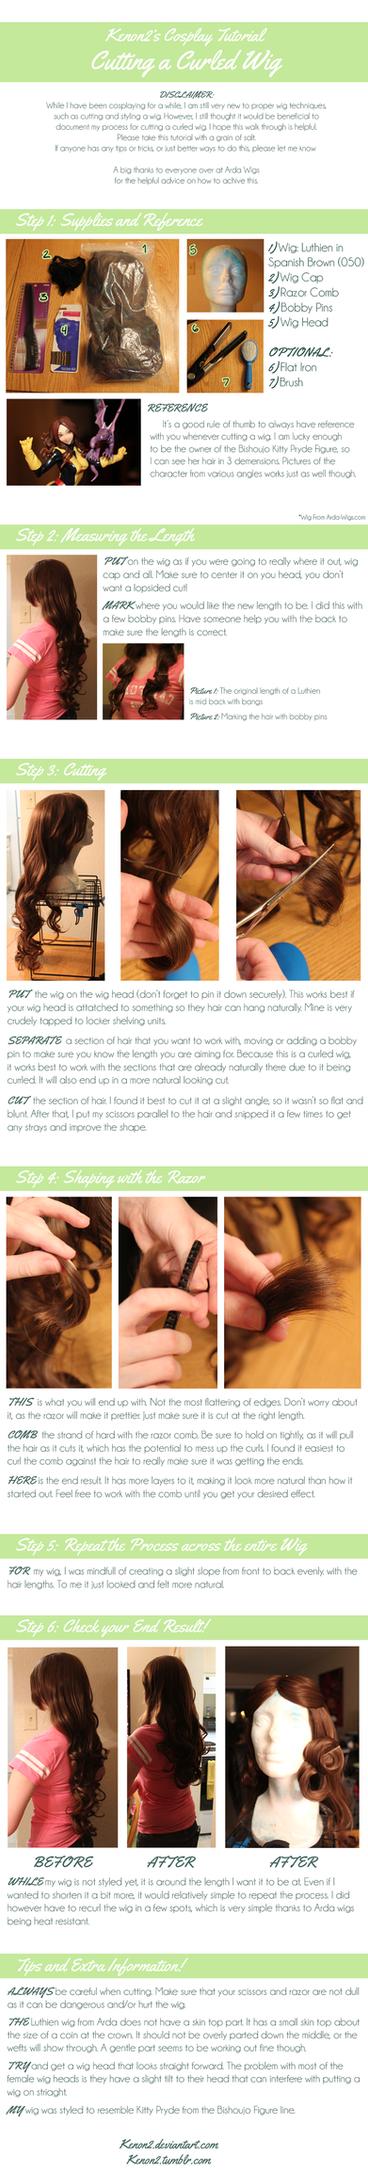 Wig Tutorial: Cutting a Curled Wig by LilyBatCosplay